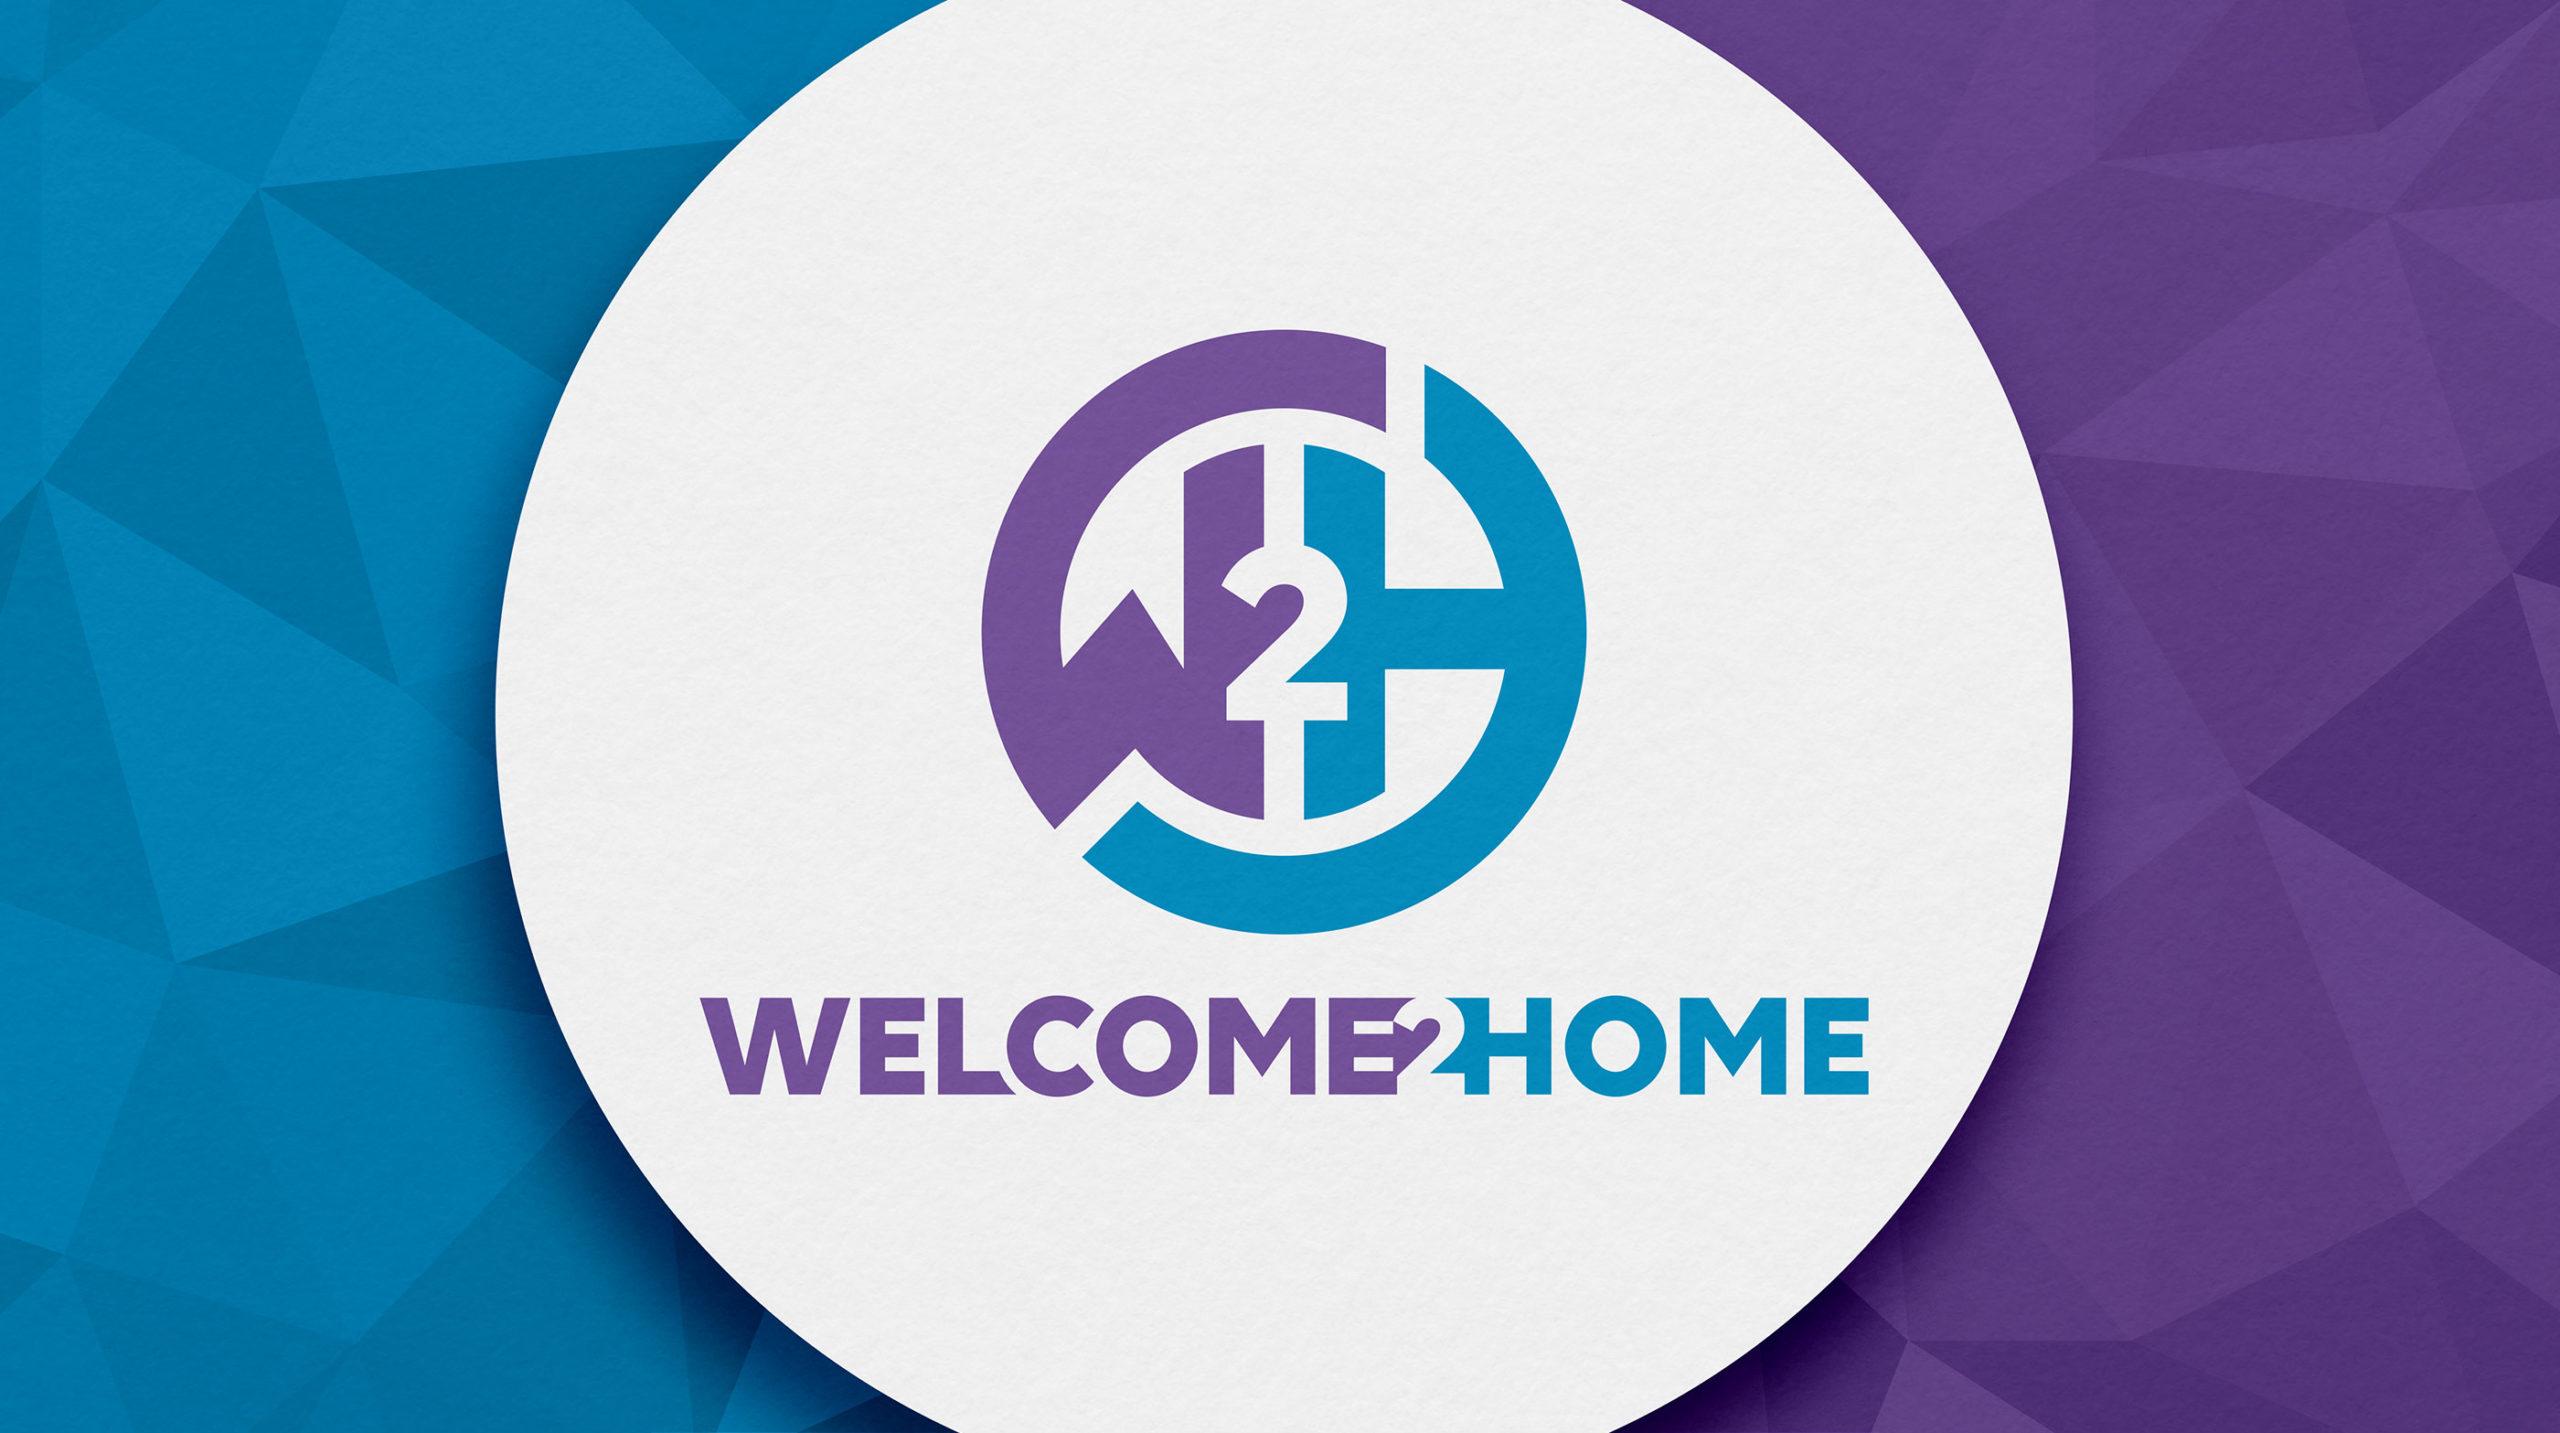 welcome 2 home logo designed by BONB Creative & Design